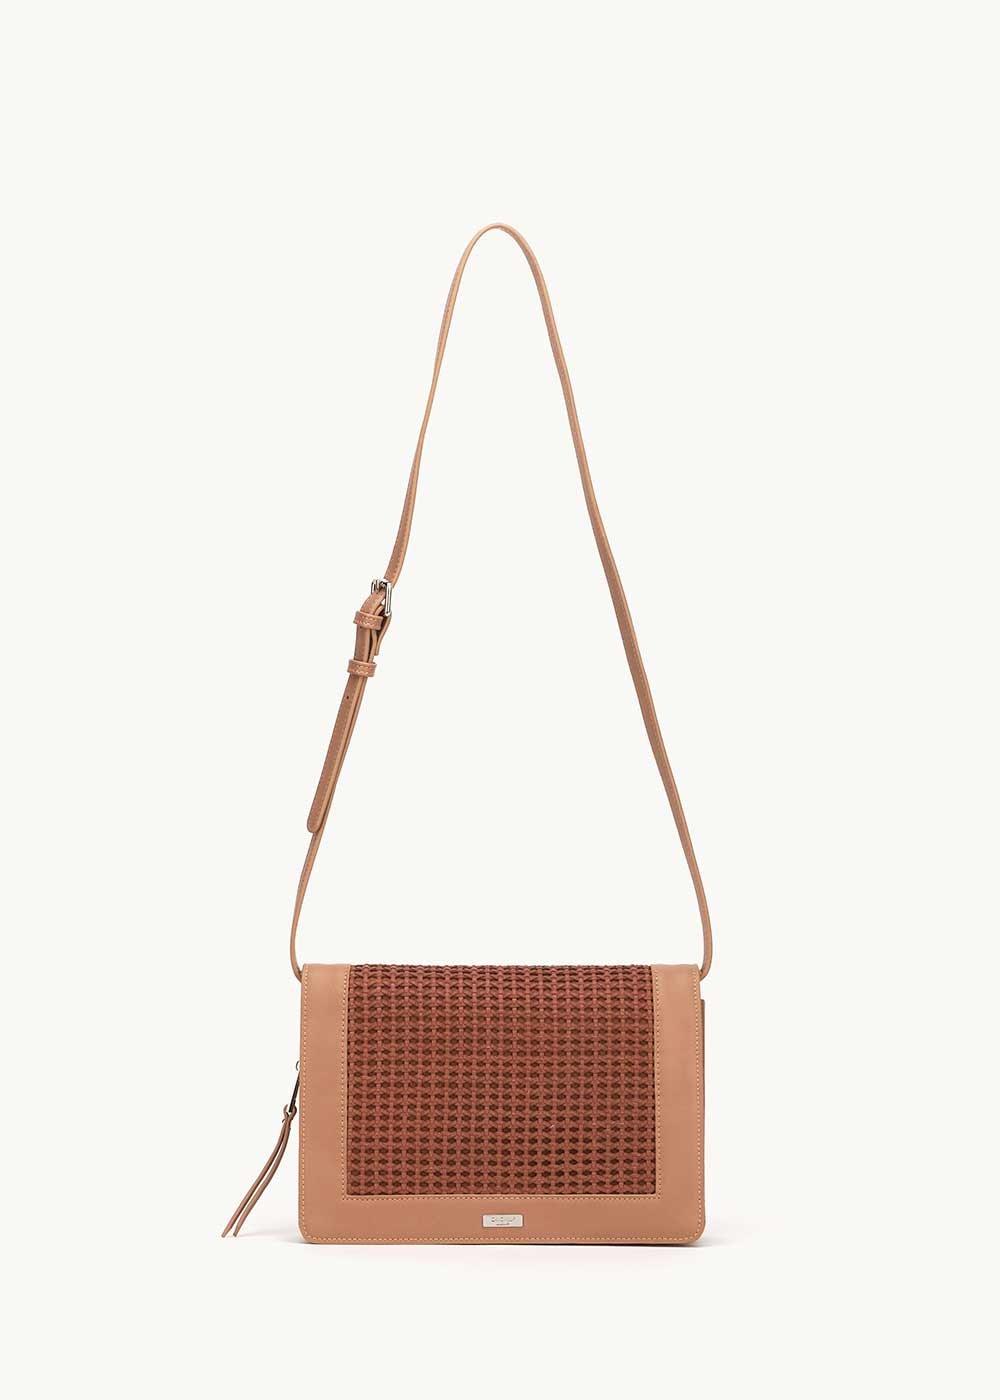 Bardhy shoulder bag with embellished front side - Pecan - Woman